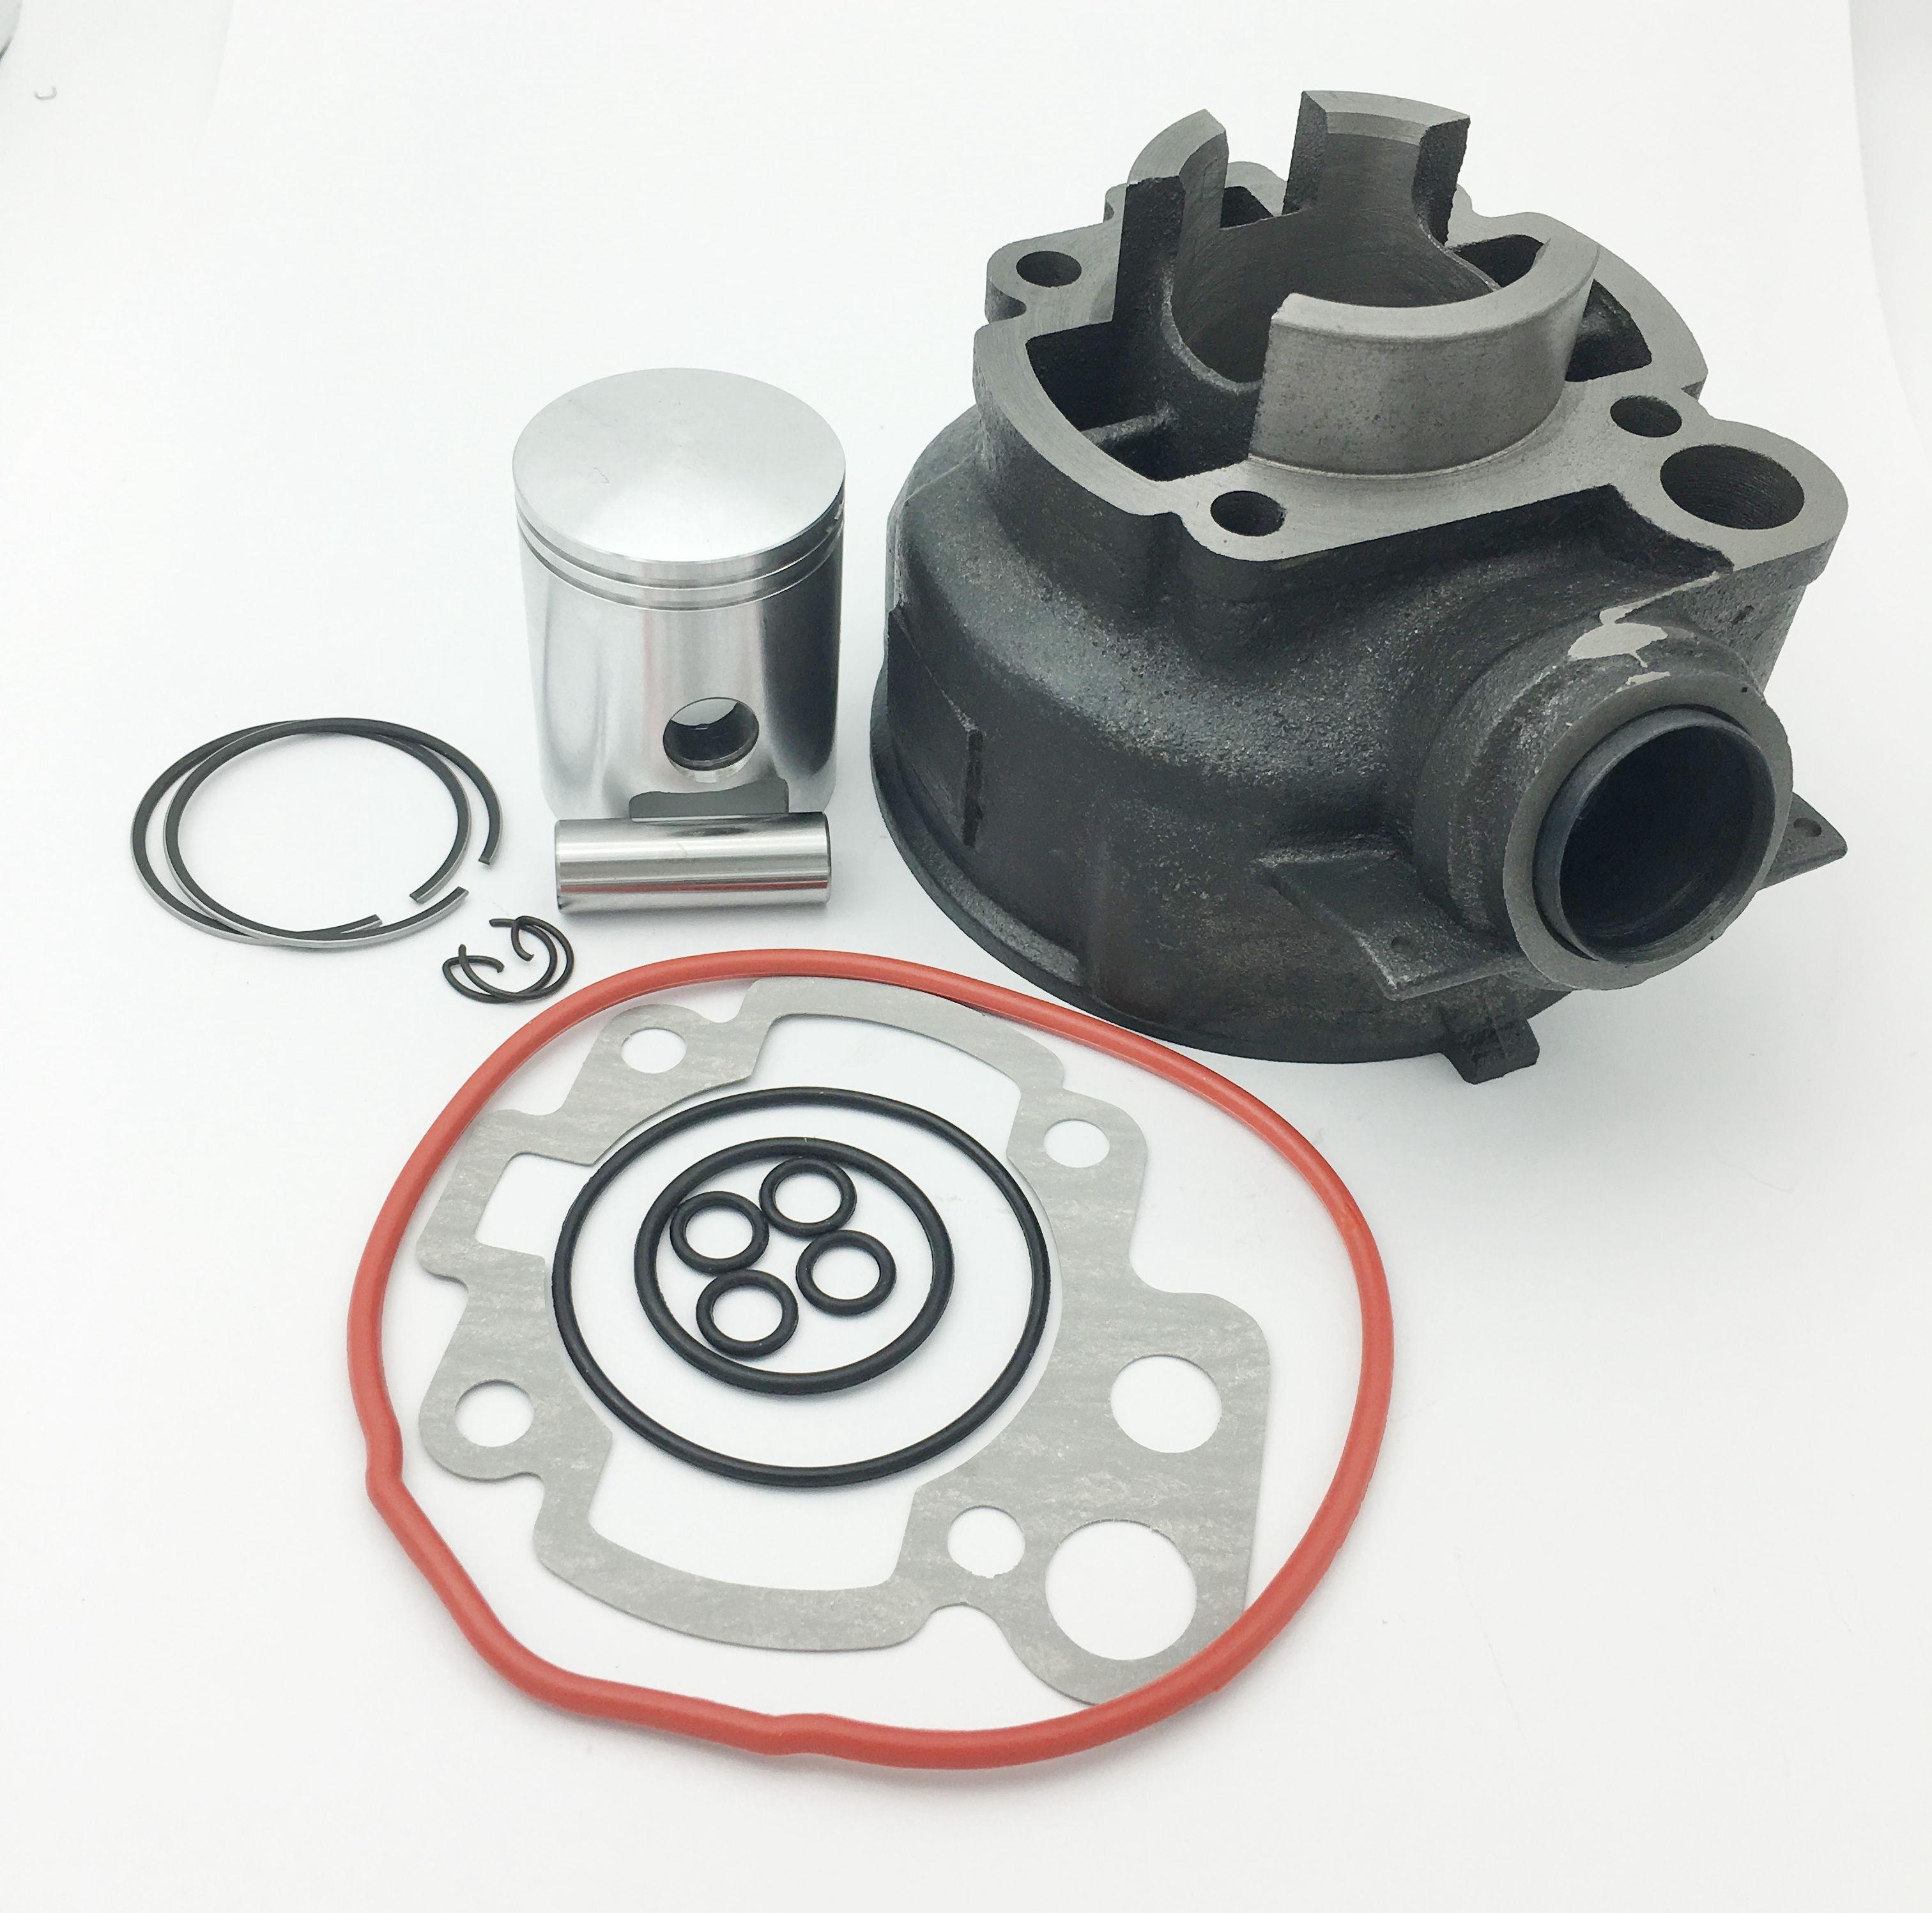 Am6 80cc Cylinderkit